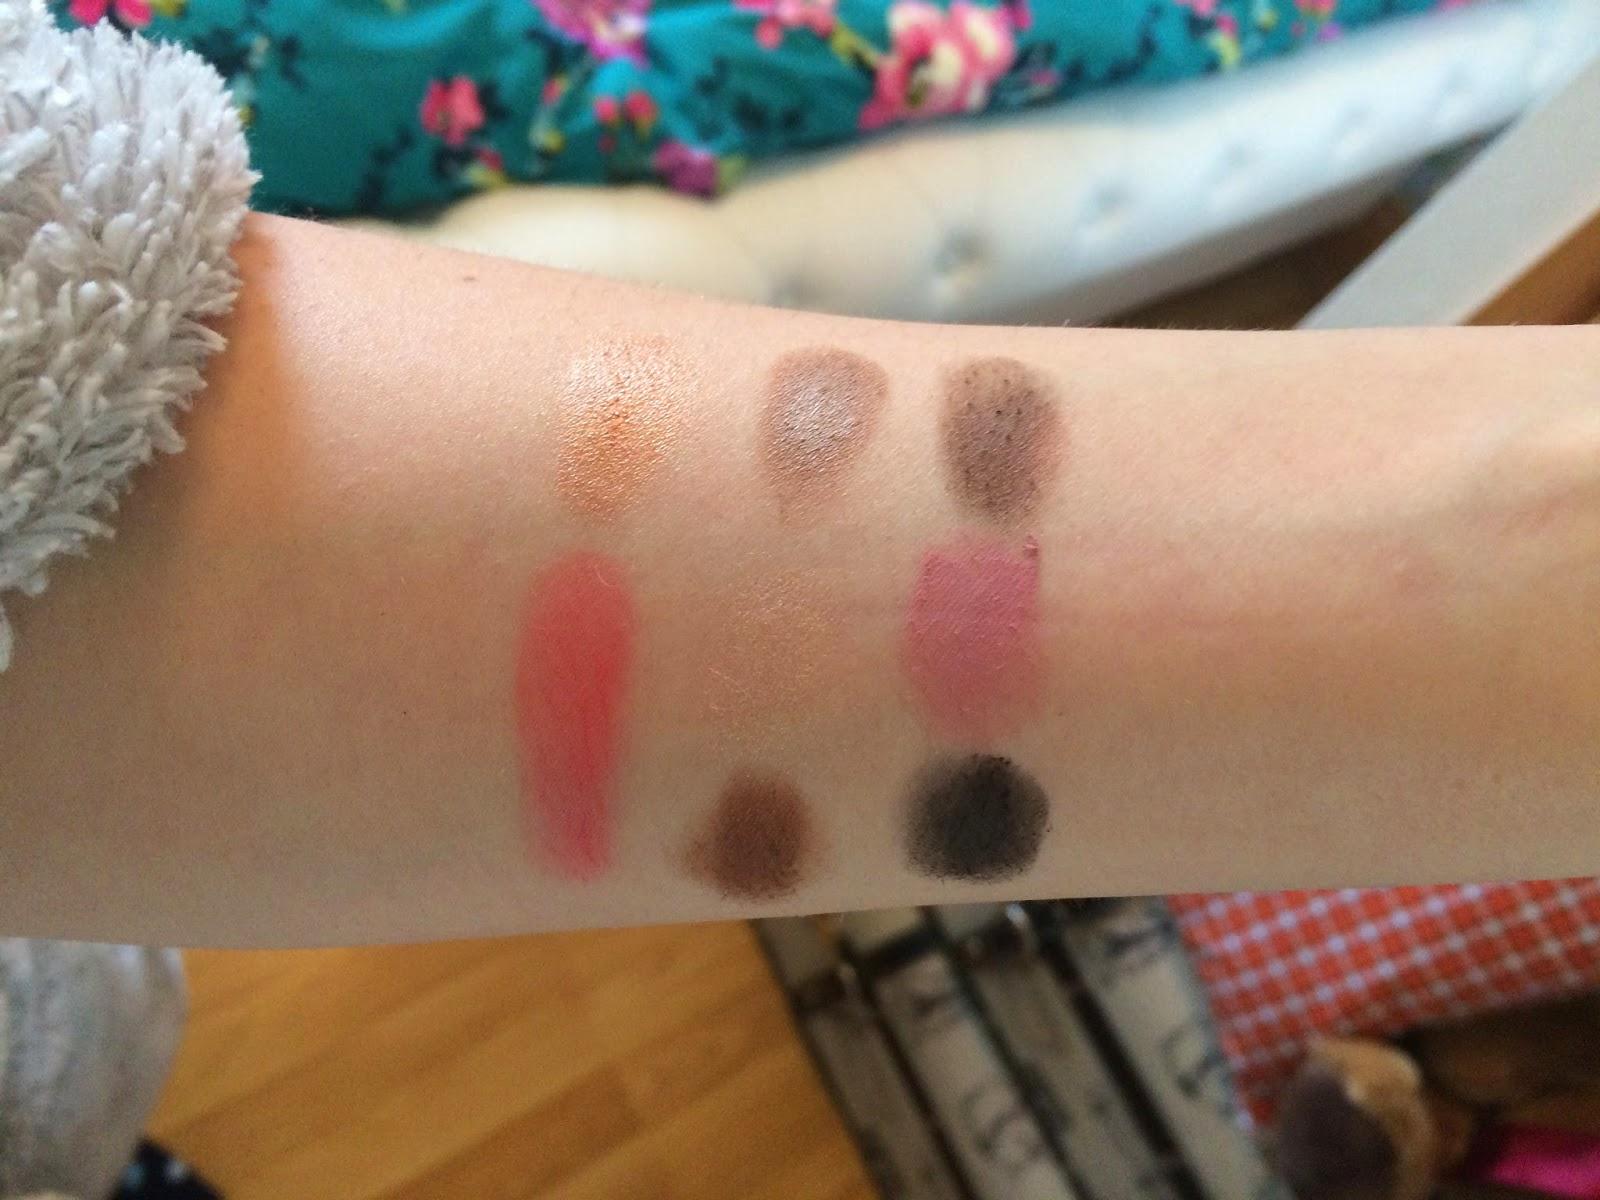 illamasqua, eyeshadow, blush, multi facets, bbloggers, beauty, make up, review, swatches